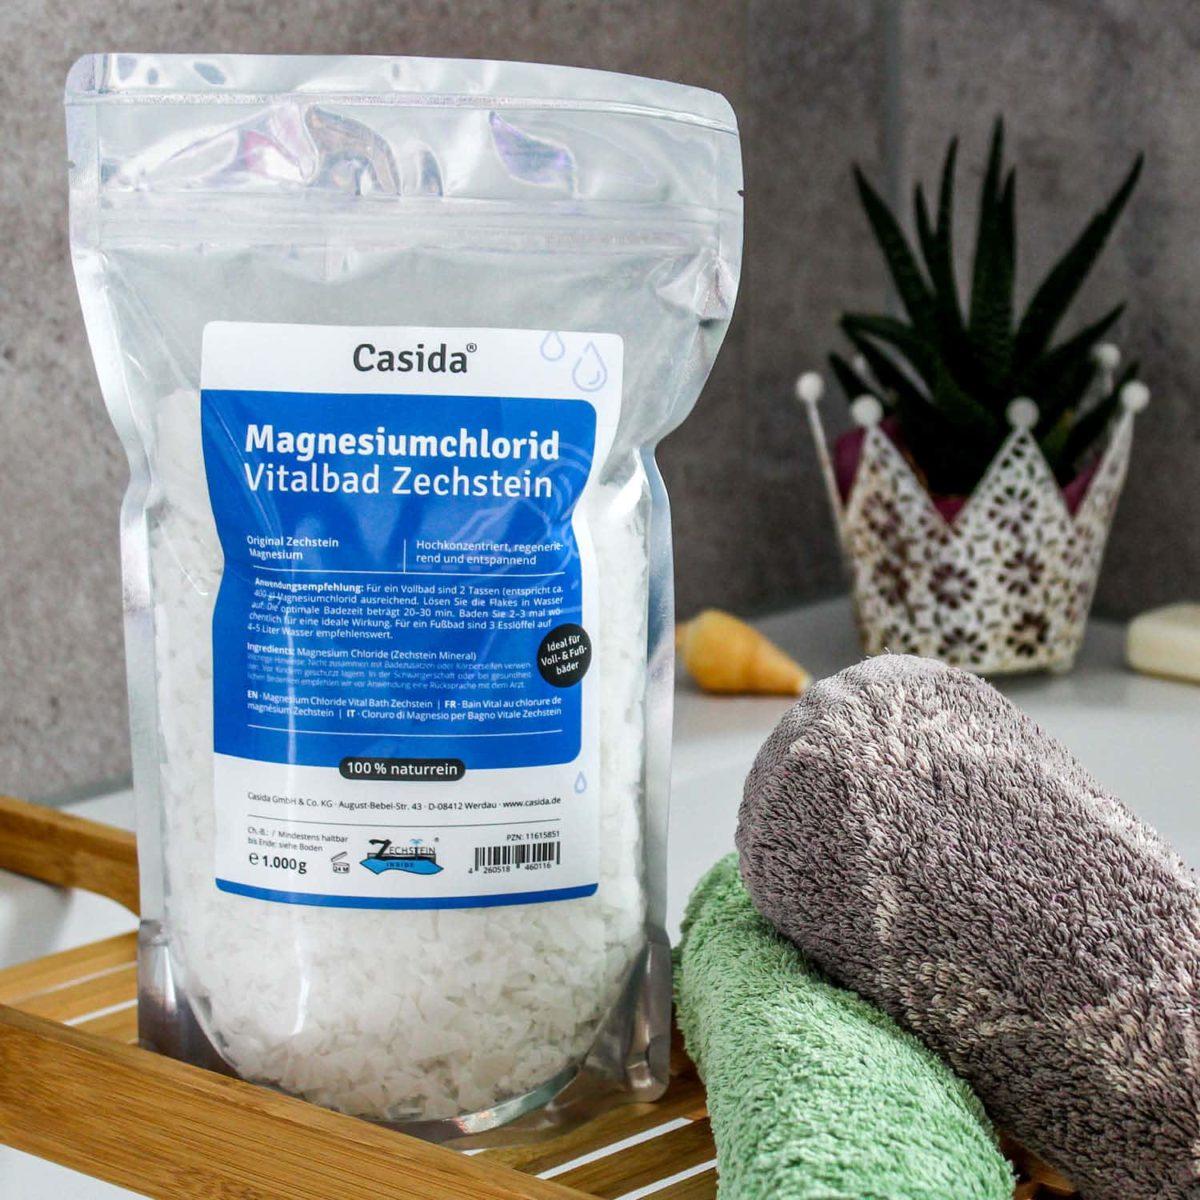 Casida Magnesiumchlorid Vitalbad Zechstein 1,0 kg 11615851 PZN Apotheke Muskelkater Sole Vollbad Fußbad Salz8